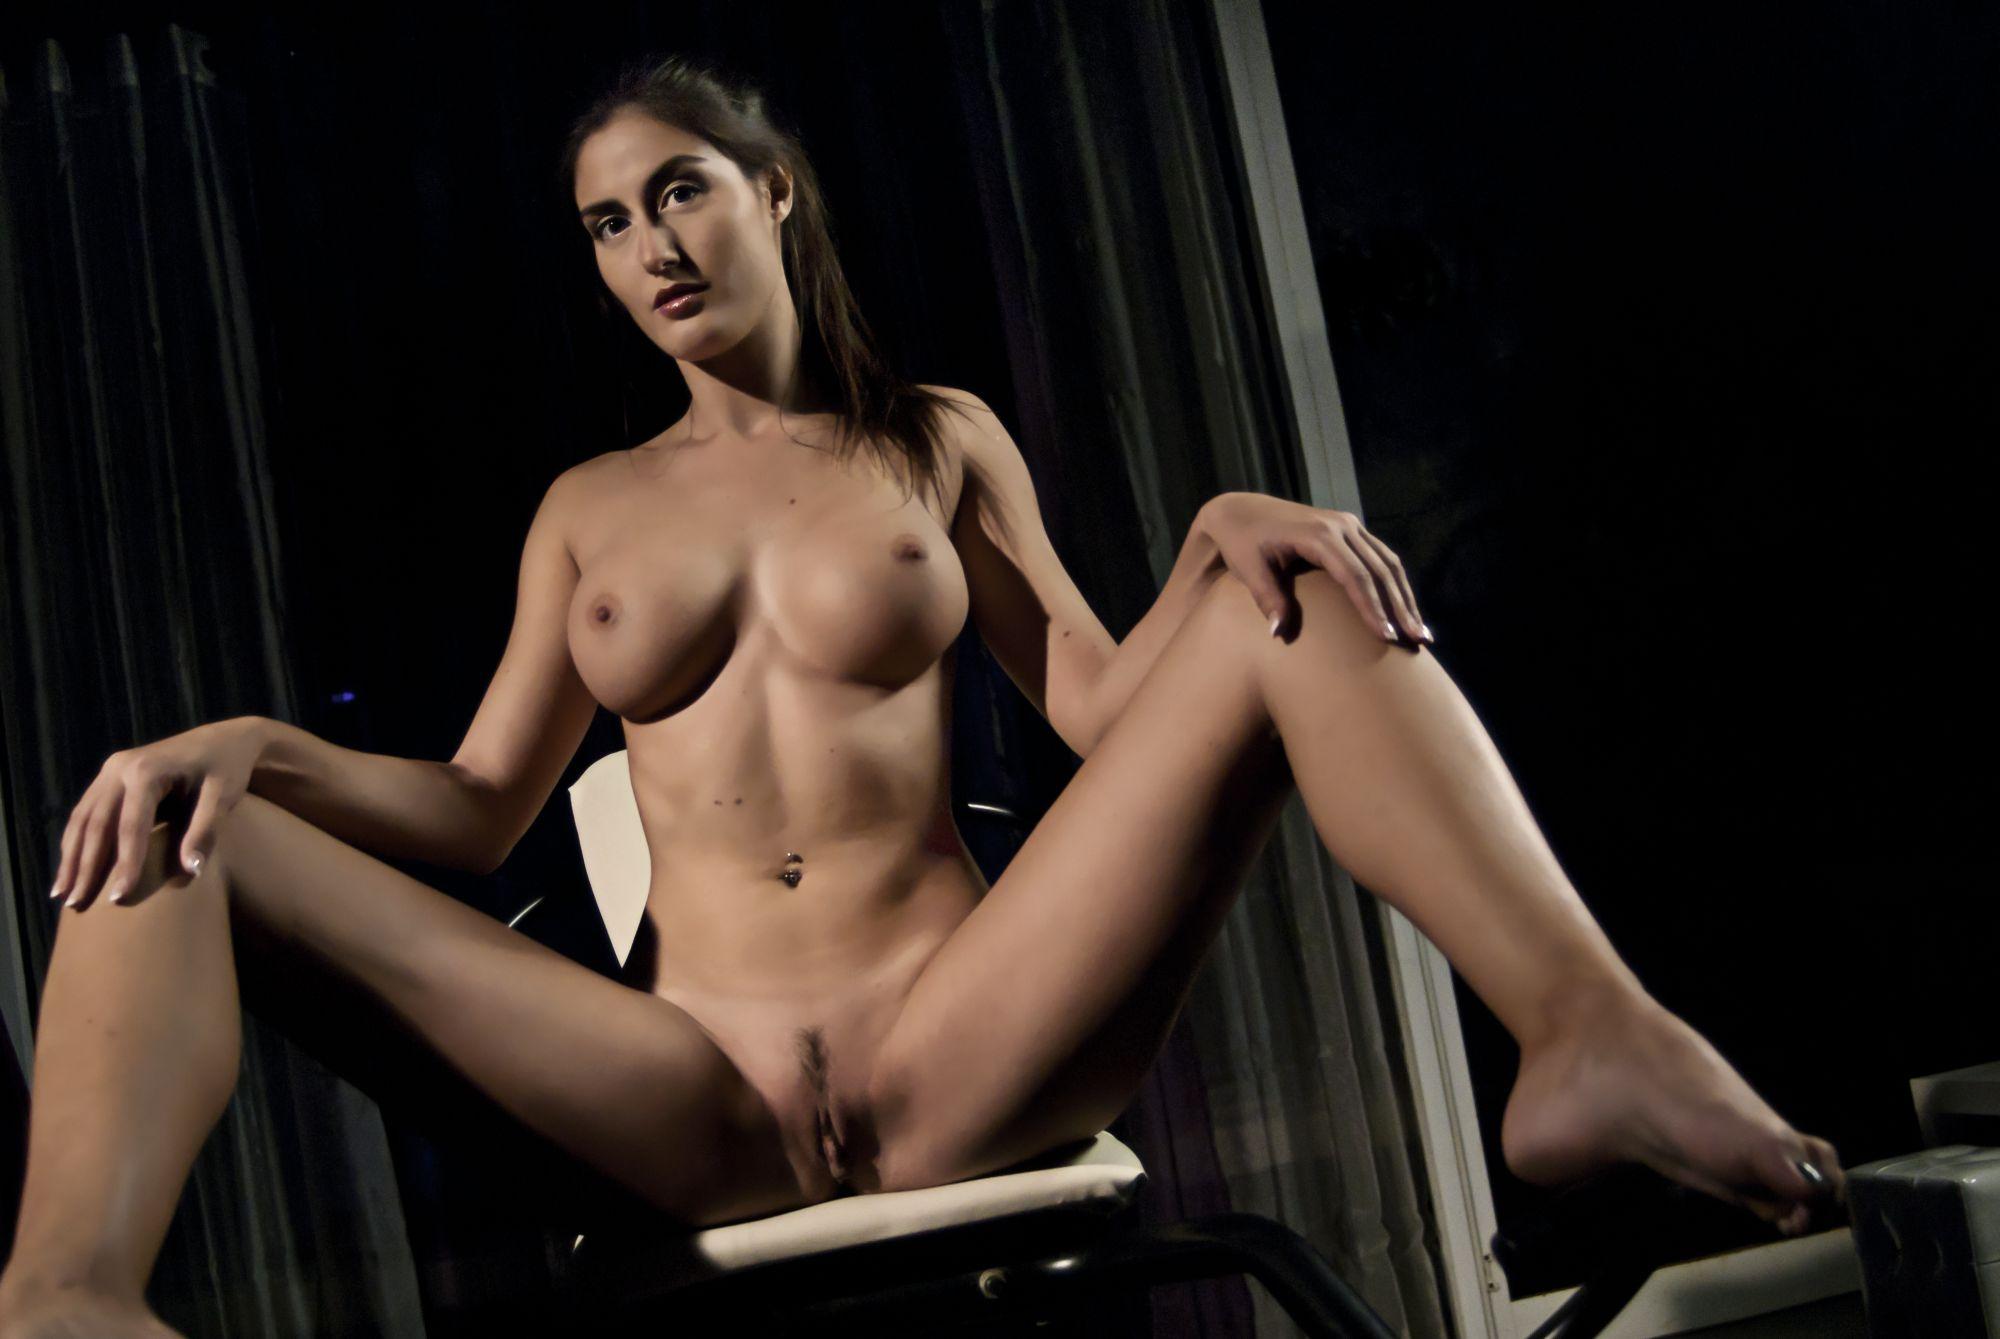 Pelicula porno americana thagson Thagson Rebeca Linares Amazing Latina Curvy Latina Goes Black And Blows Some Big Dick Thagson 557567 Good Sex Porn